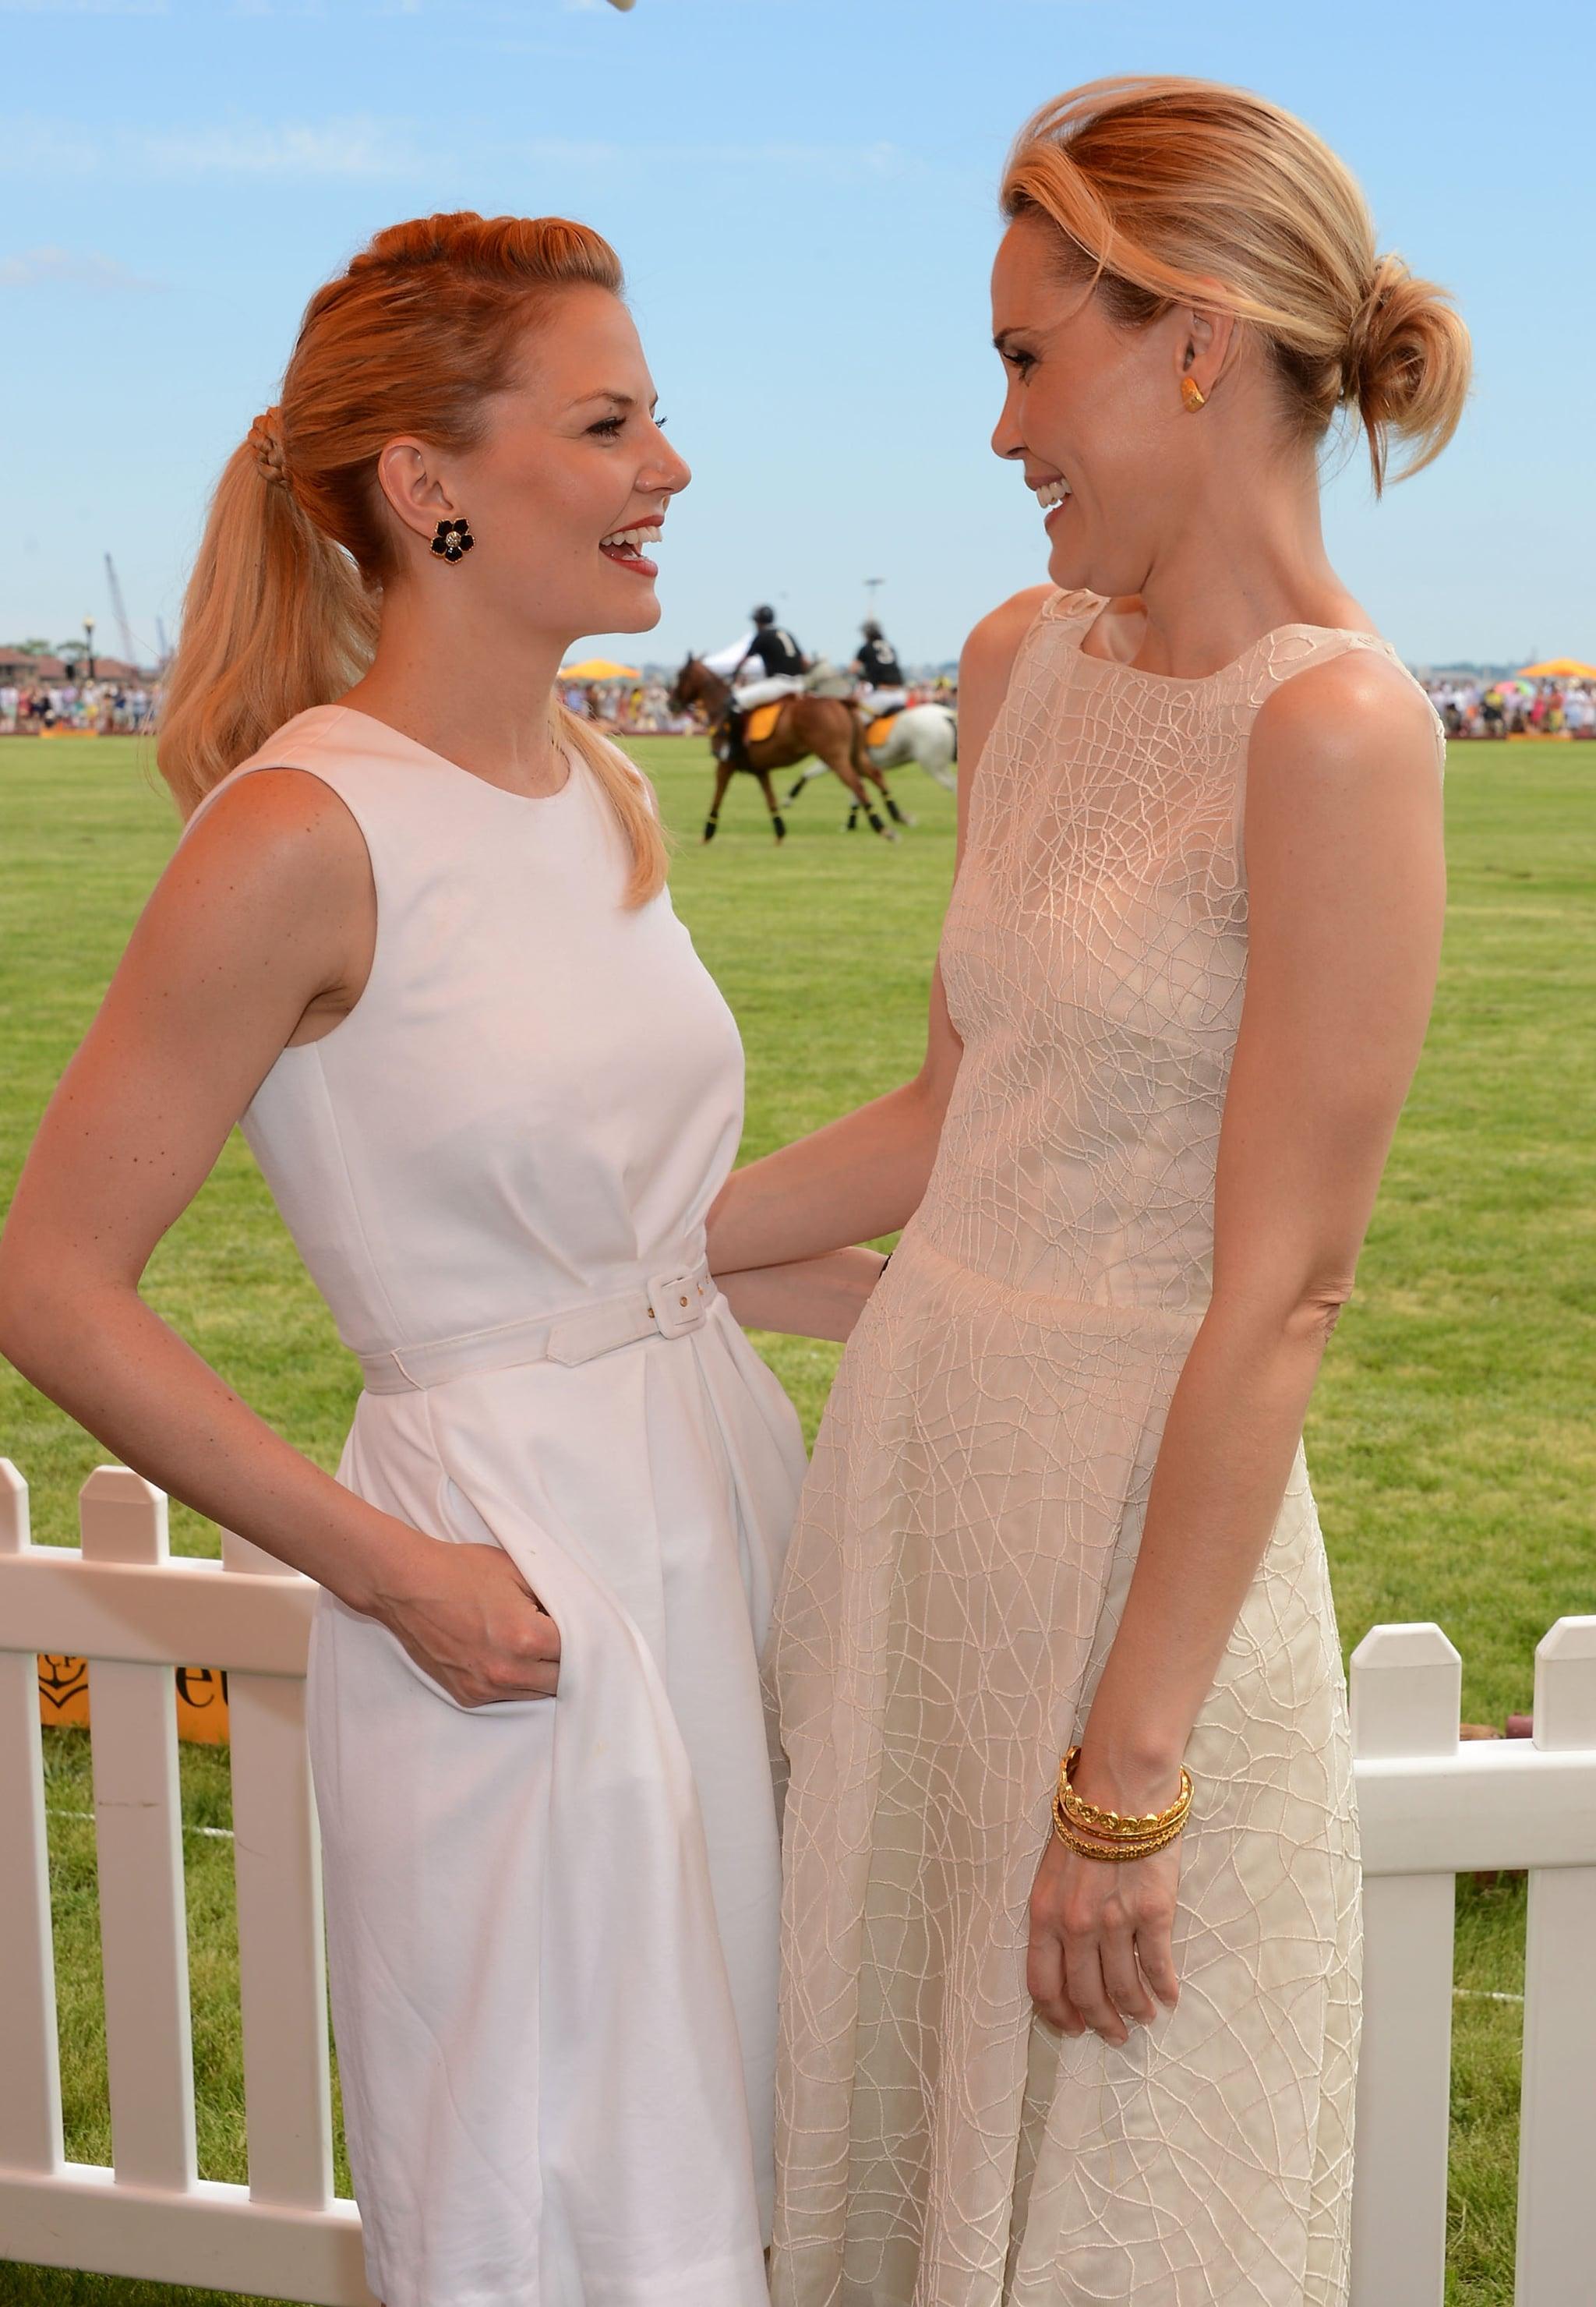 Rachel Zoe Brings Skyler Along For a Polo Day With Clive Owen